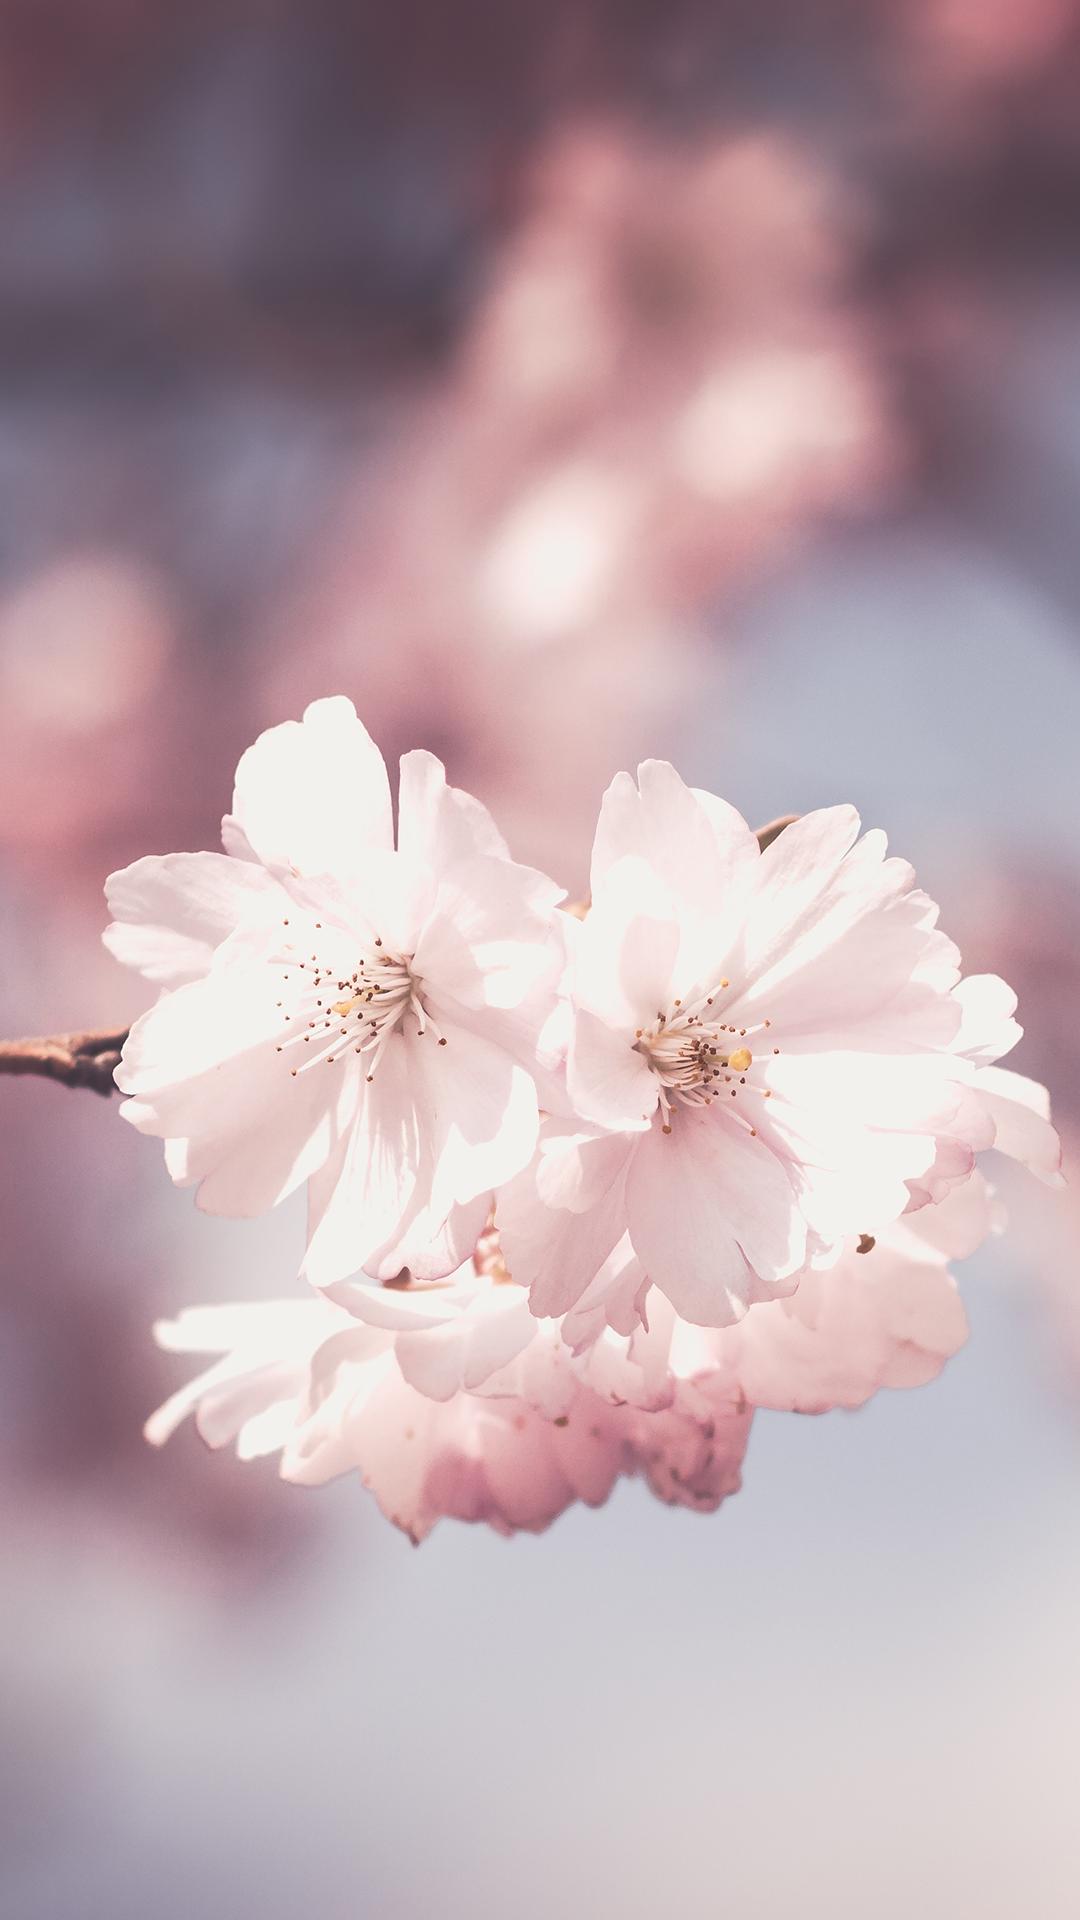 Flower Phone Wallpaper – Top wallpaper Ideas For Smart & Fashionable Cellphones